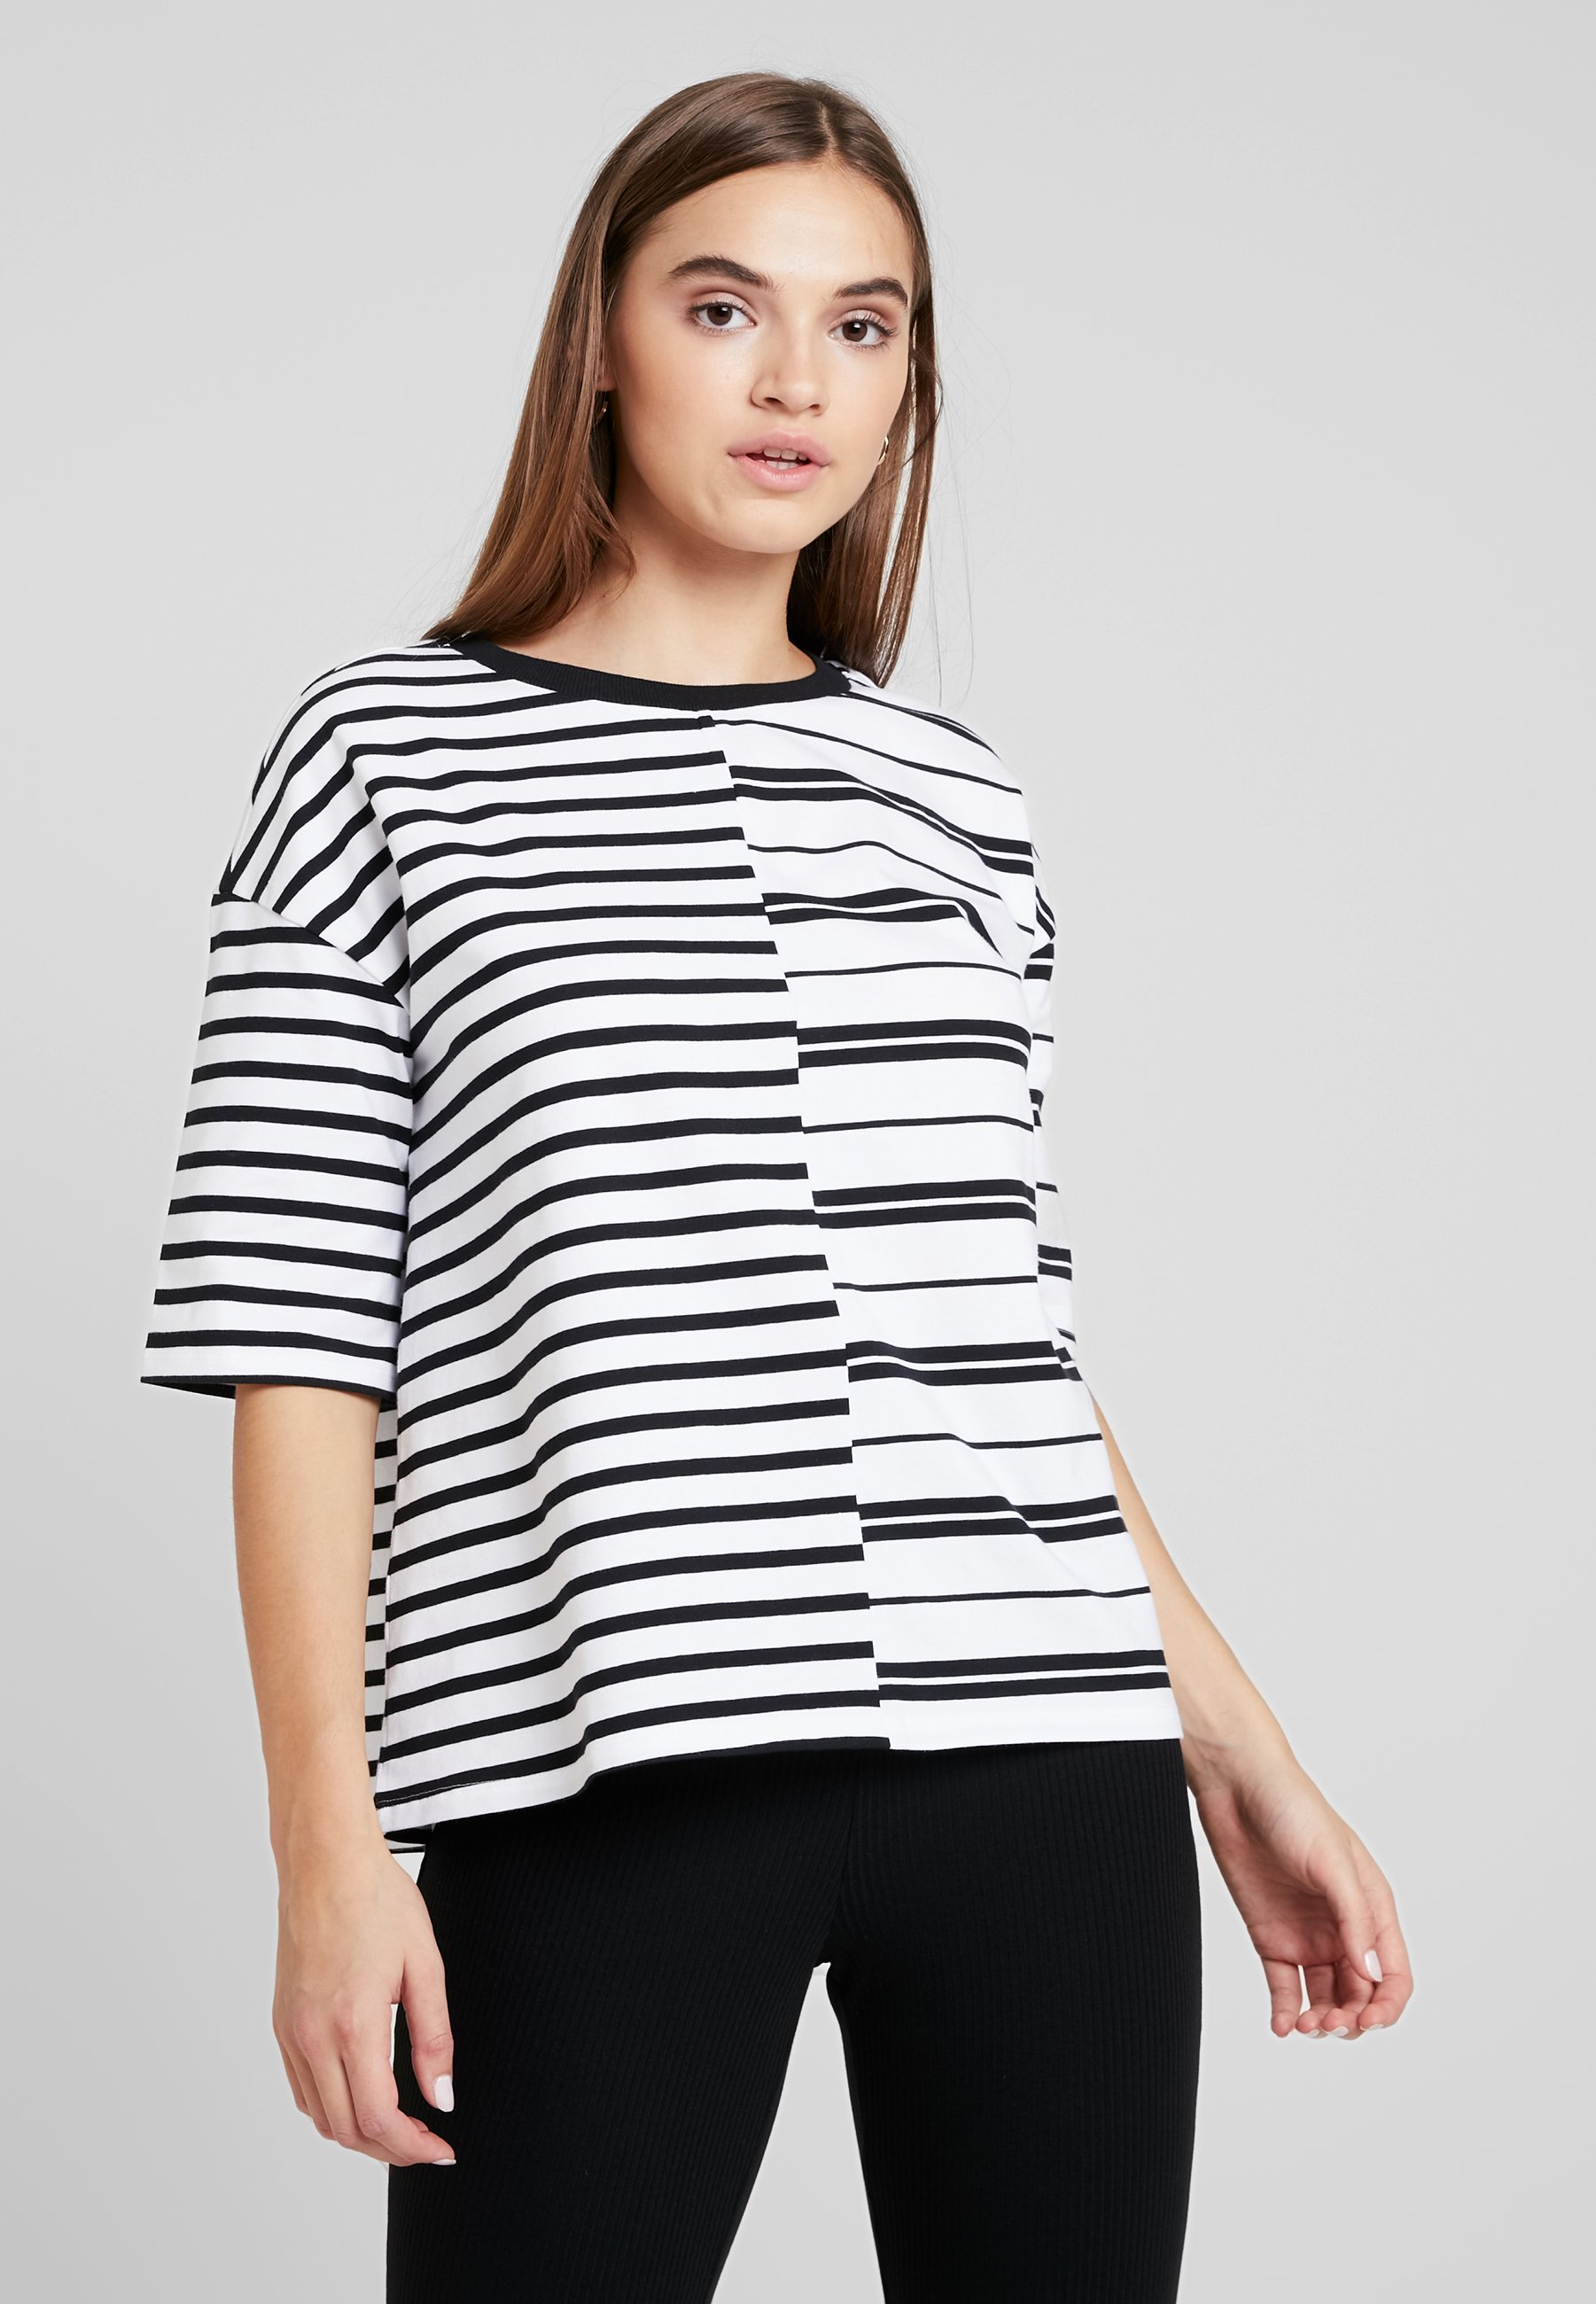 Imprimé NmleoT May White black shirt Noisy Bright BdCoWerx